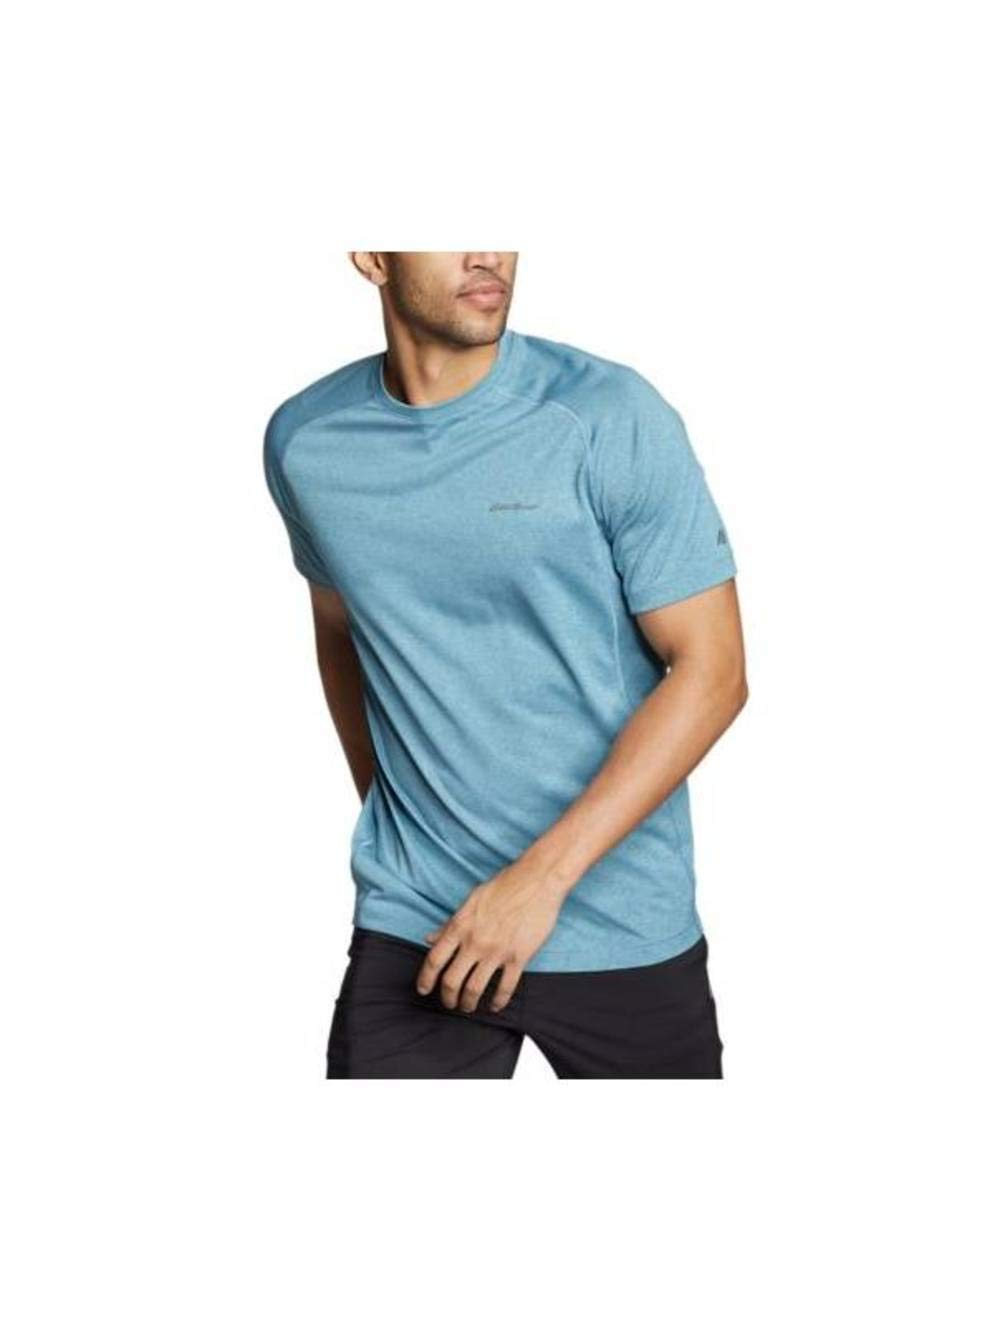 Eddie Bauer Men's Resolution Short-Sleeve T-Shirt, Rain Regular S